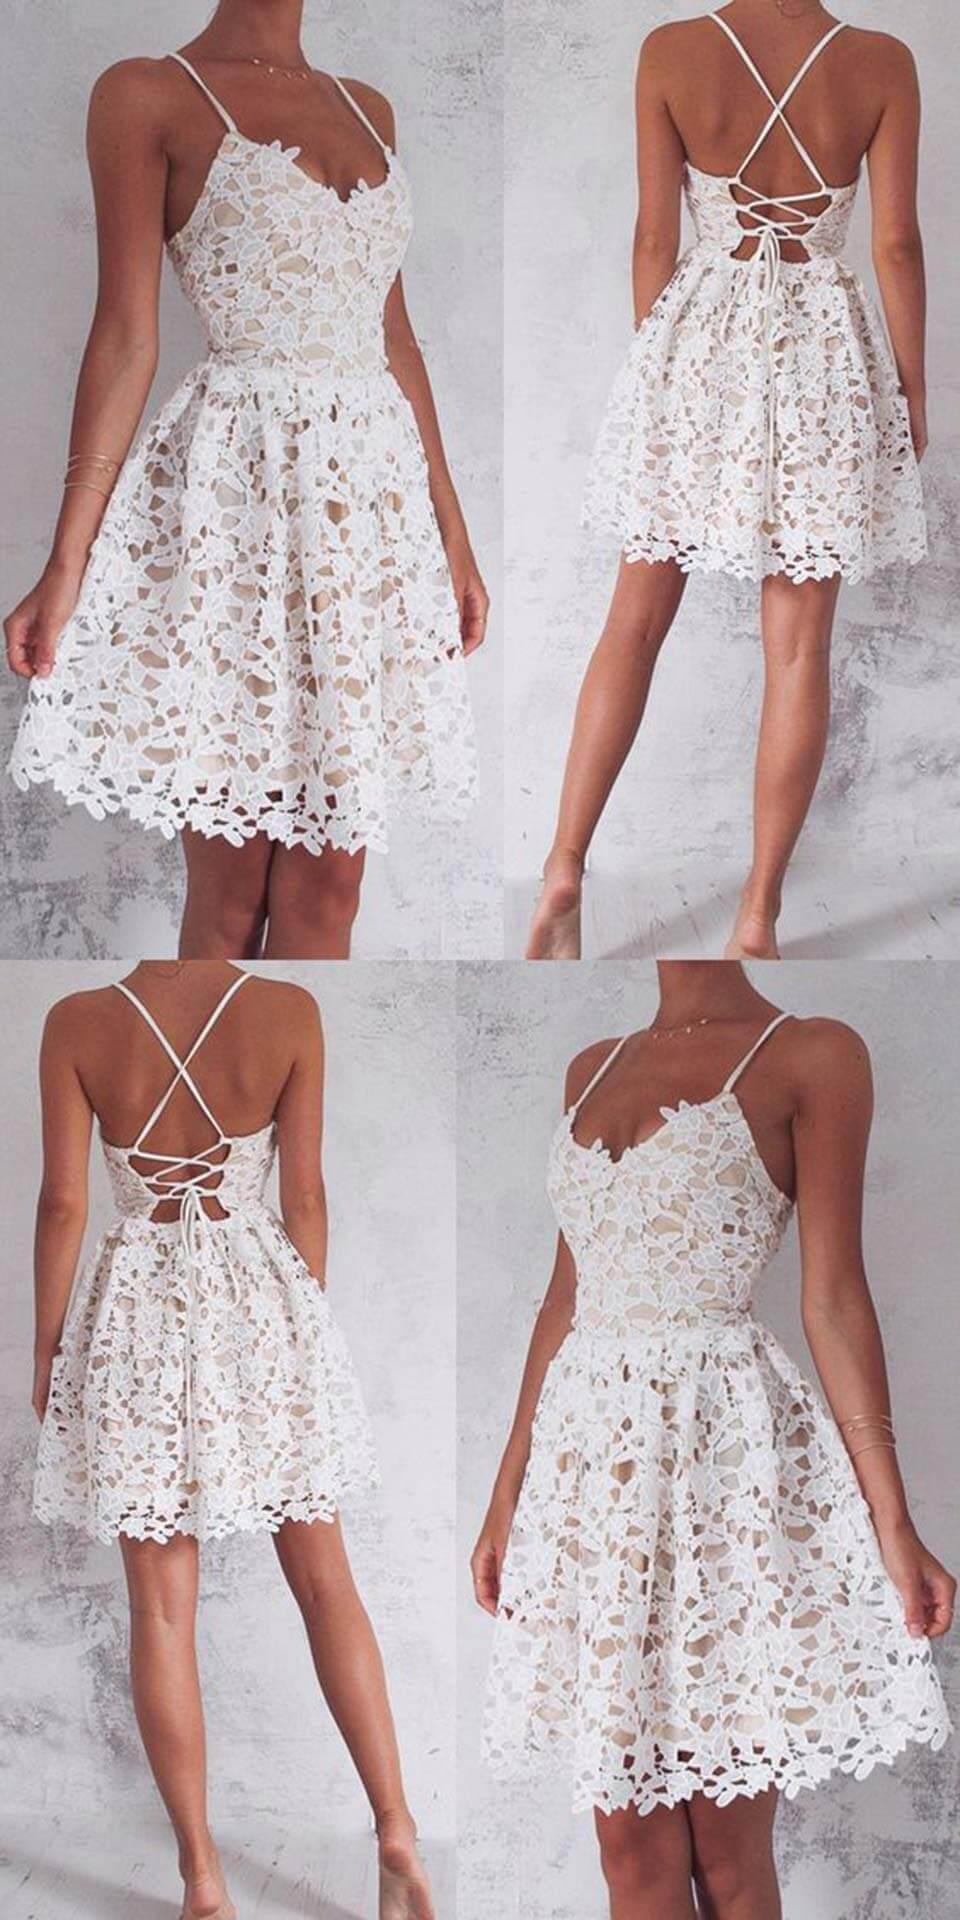 Vestido branco com renda